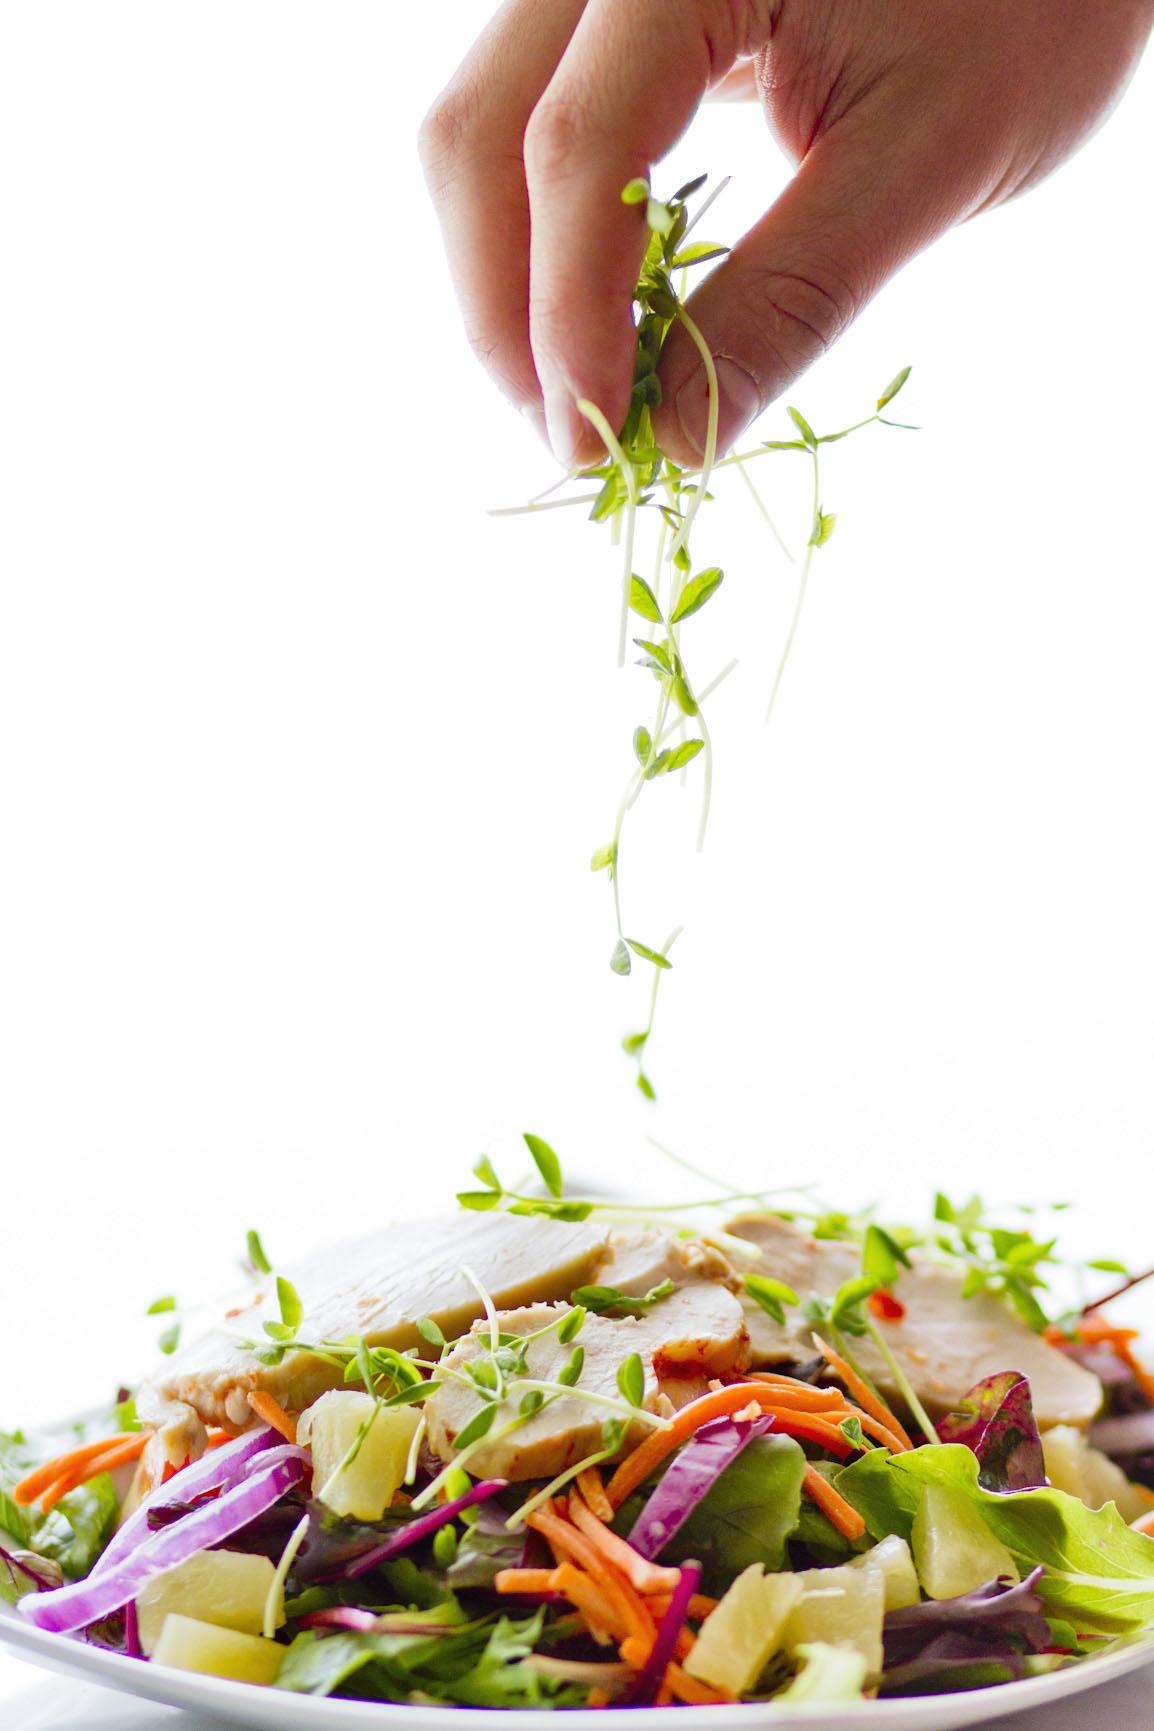 making-salad-food-photography.jpg